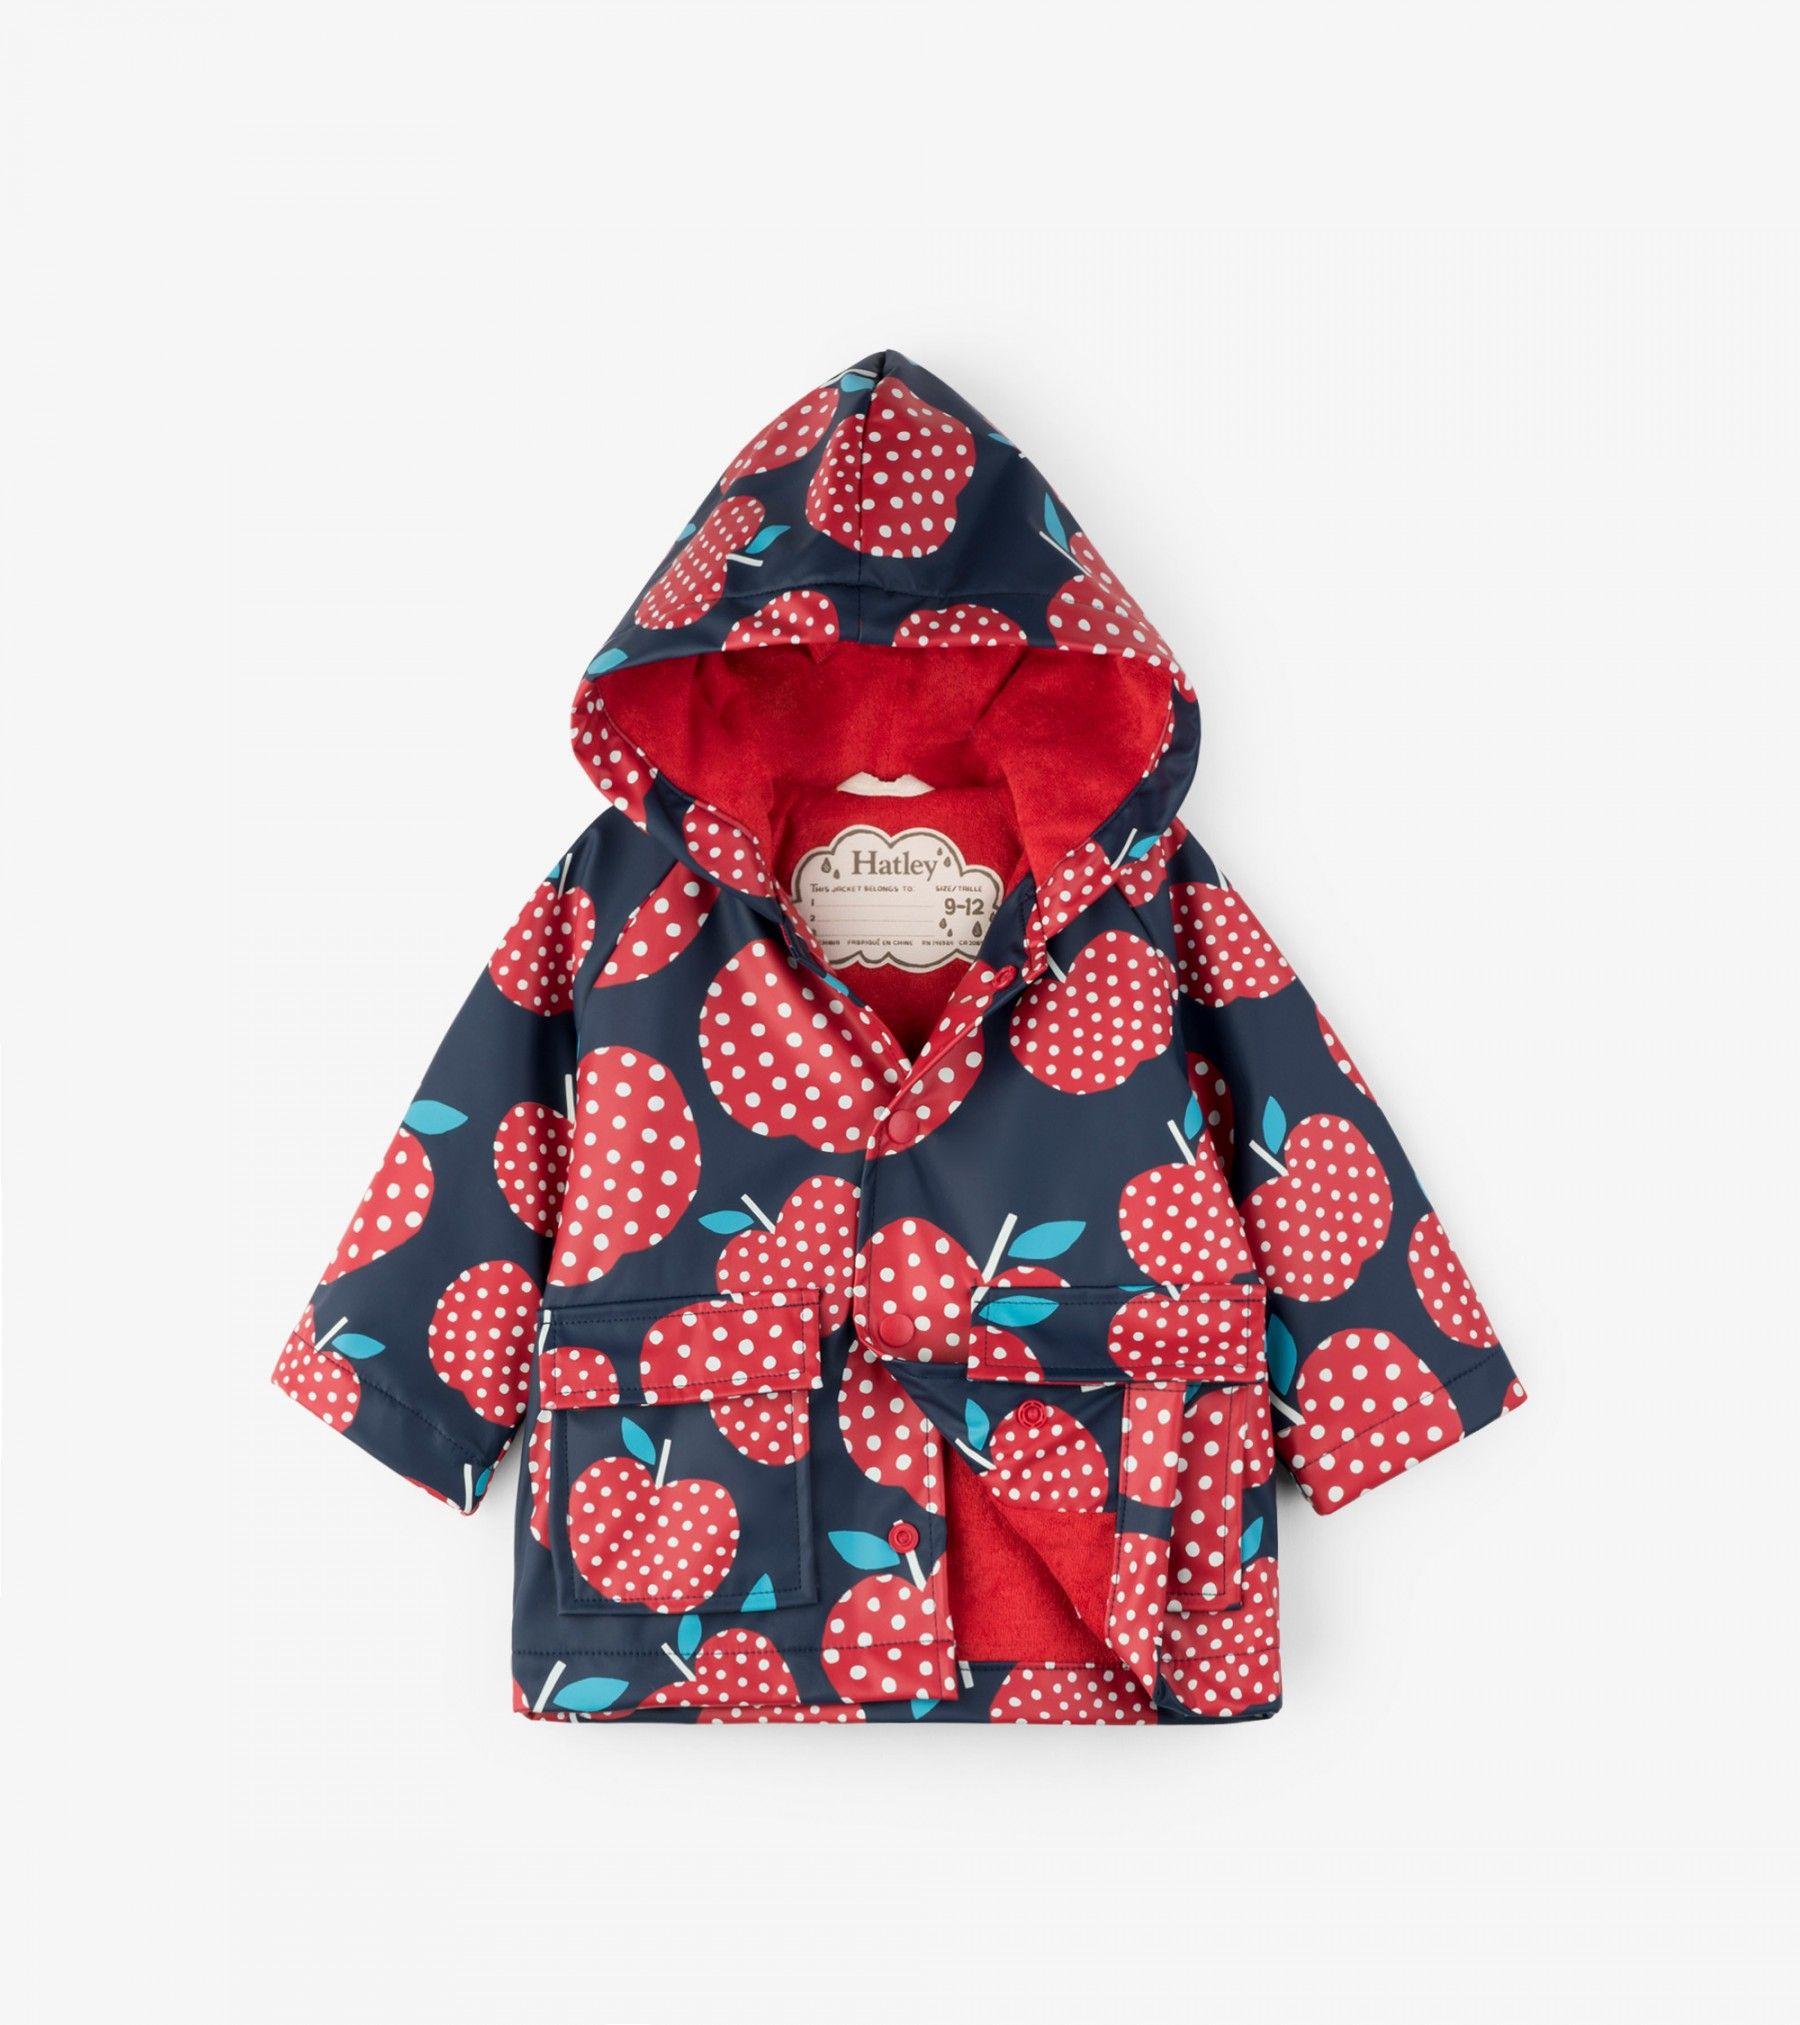 Polka Dot Apples Classic Baby Raincoat Sale Categories Baby Girls Hatley Canada Baby Raincoat Girls Raincoat Kids Robes